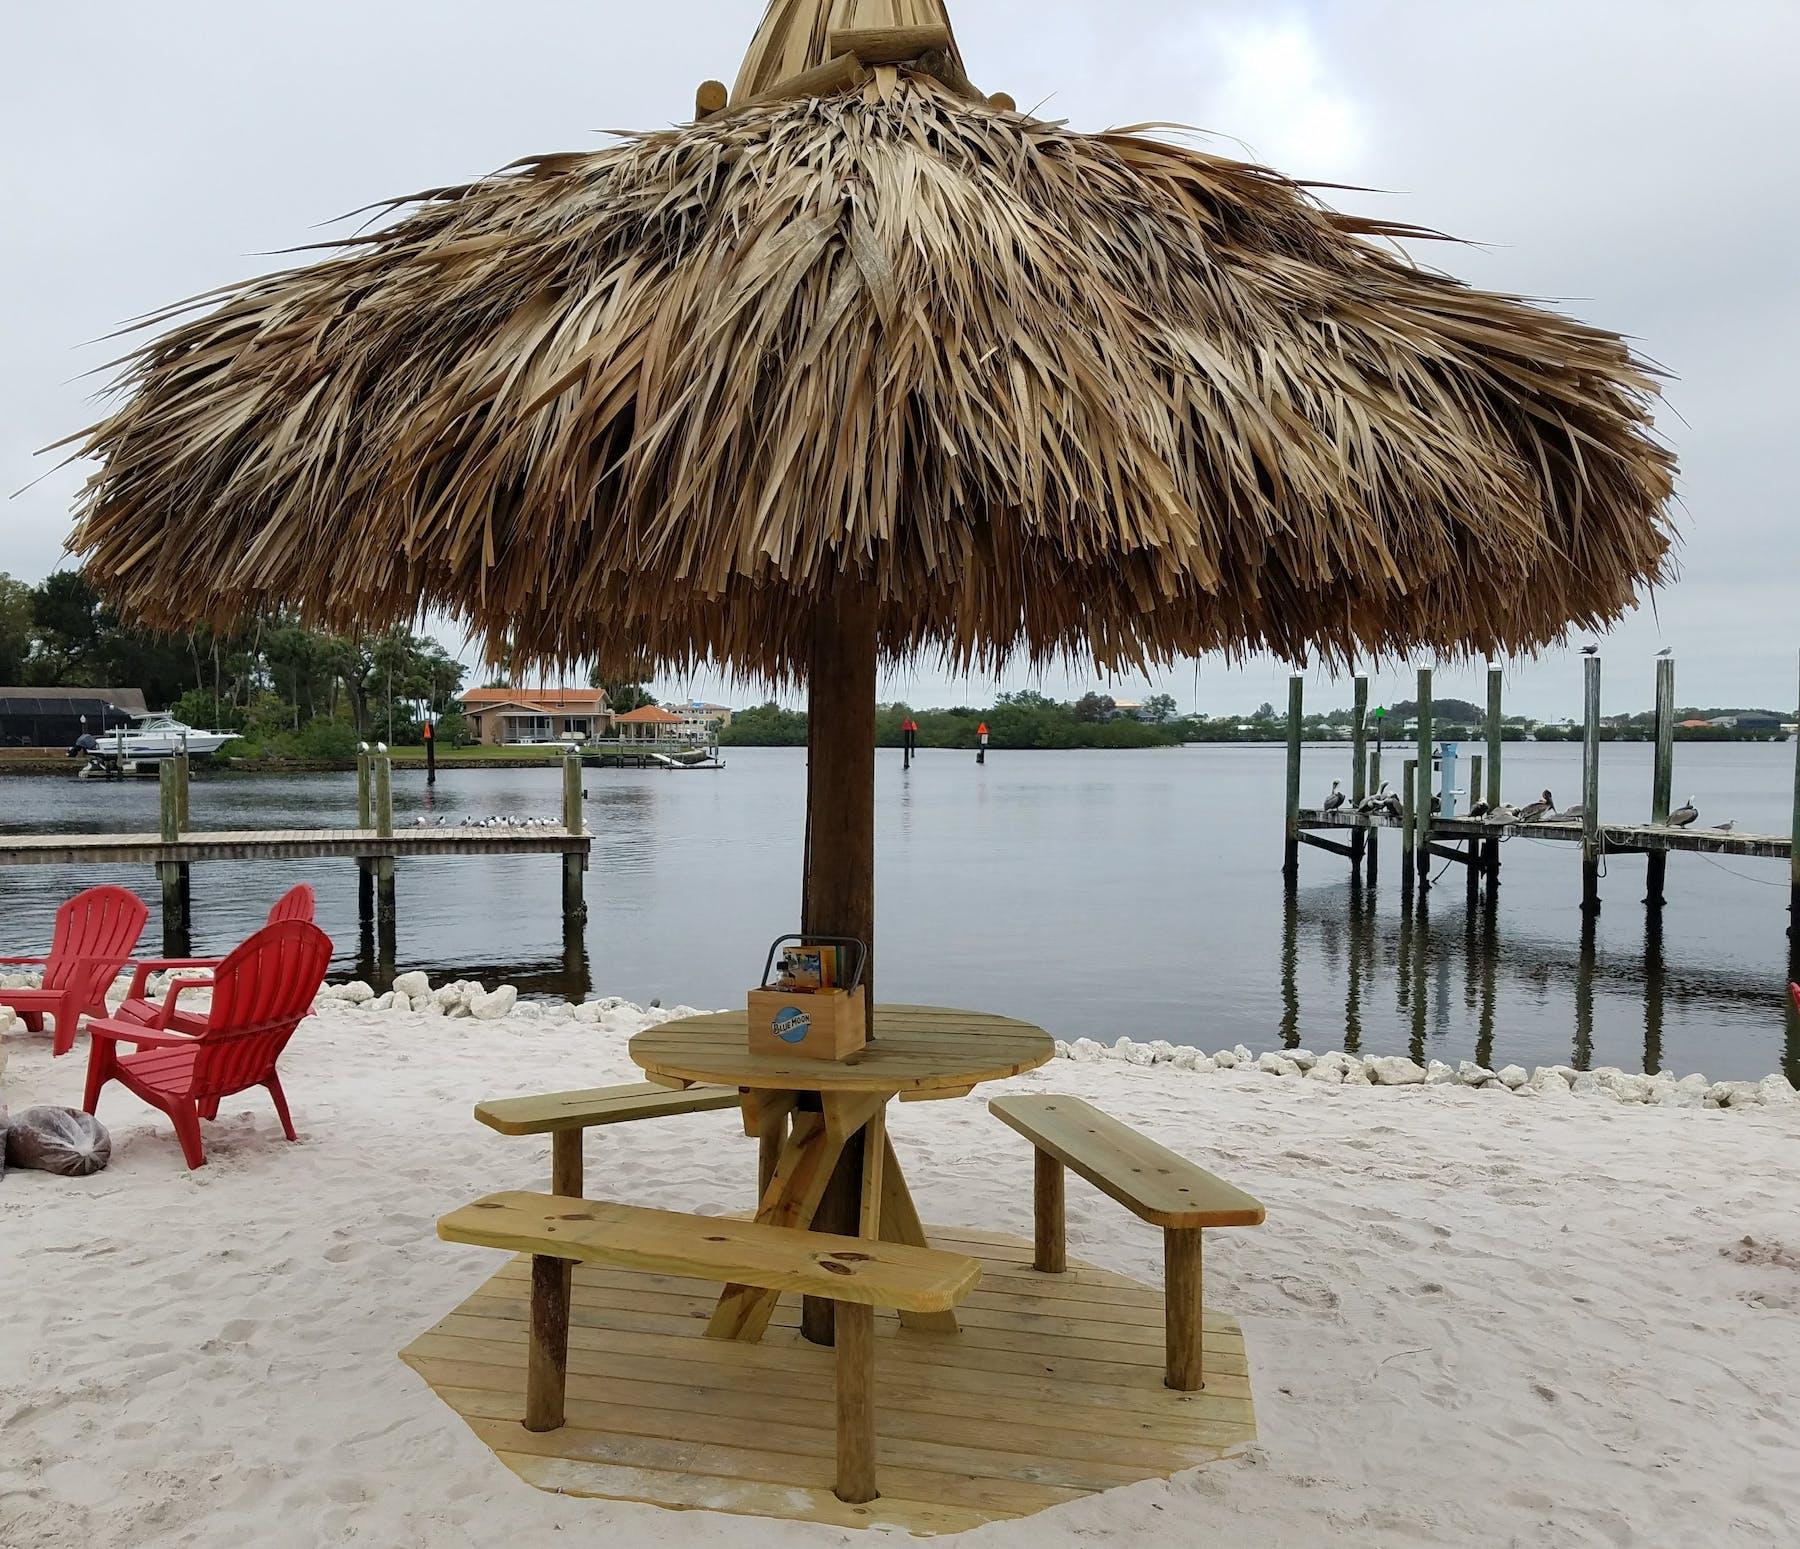 an umbrella sitting on top of a sandy beach